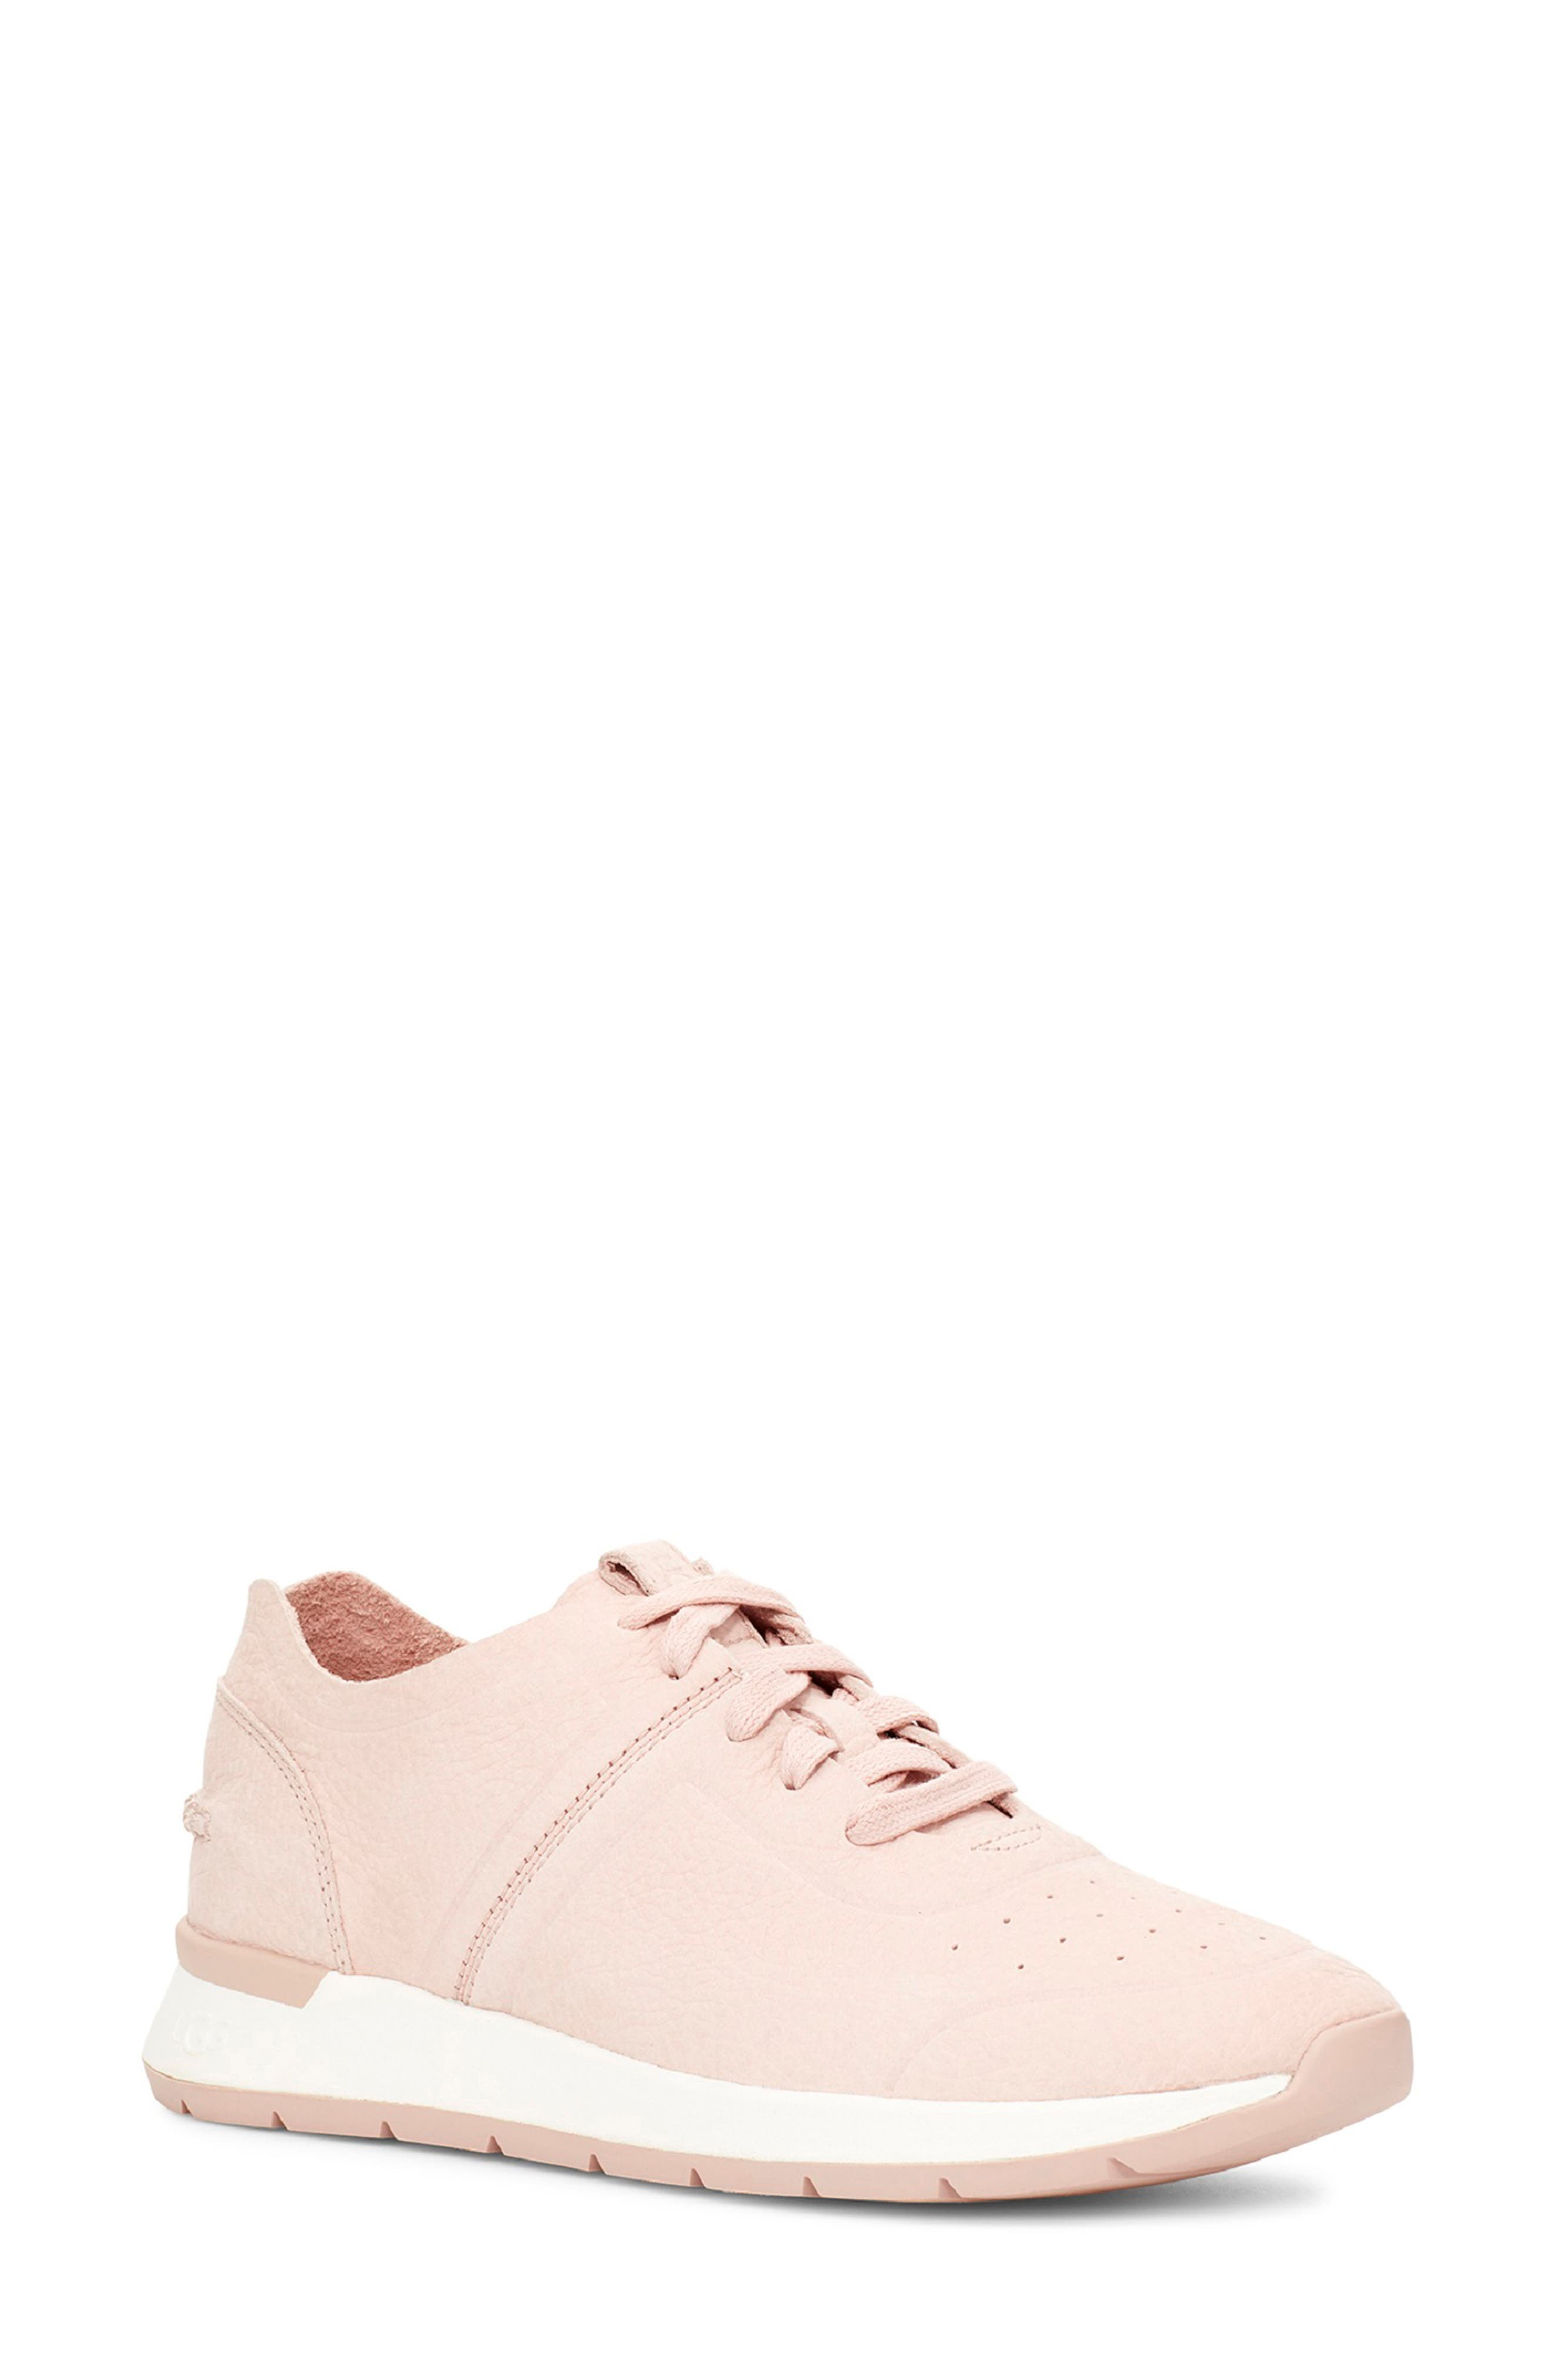 UGG® Sneakers \u0026 Athletic Shoes | Nordstrom